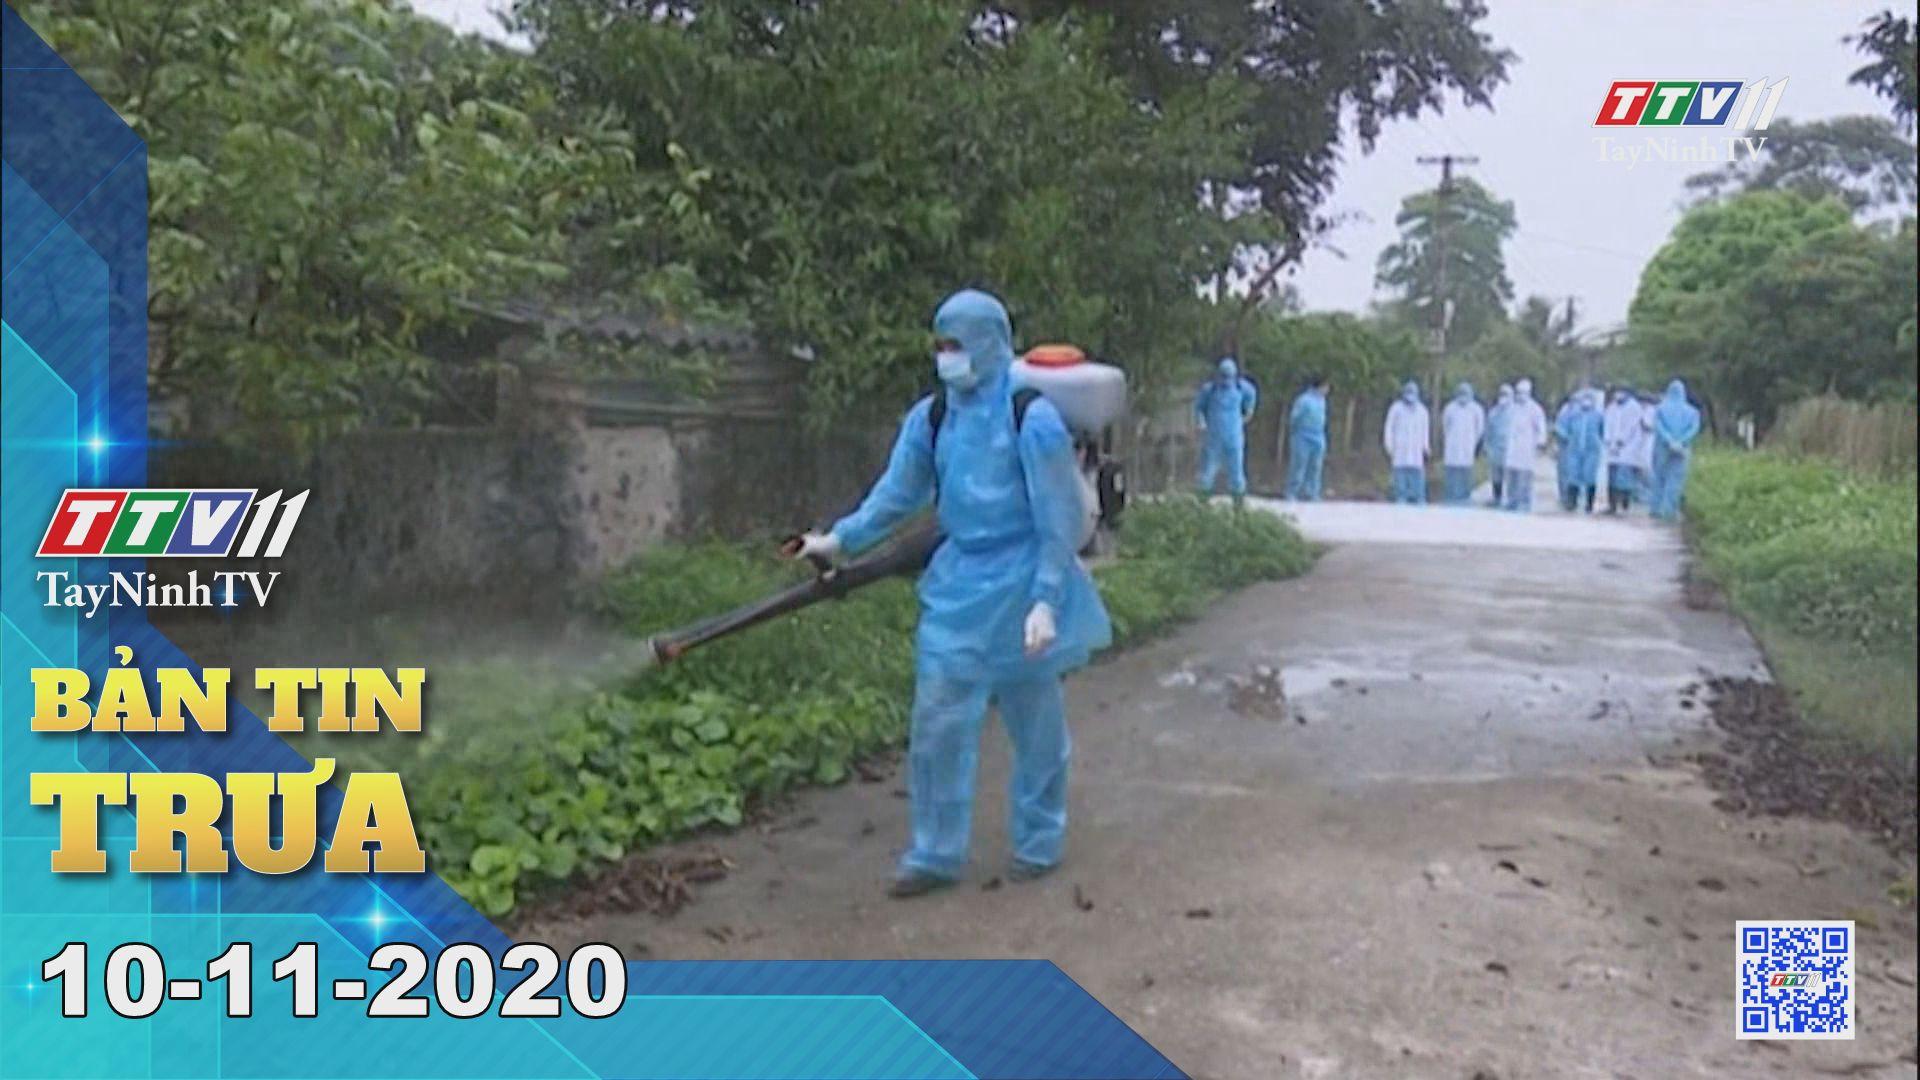 Bản tin trưa 10-11-2020 | Tin tức hôm nay | TayNinhTV